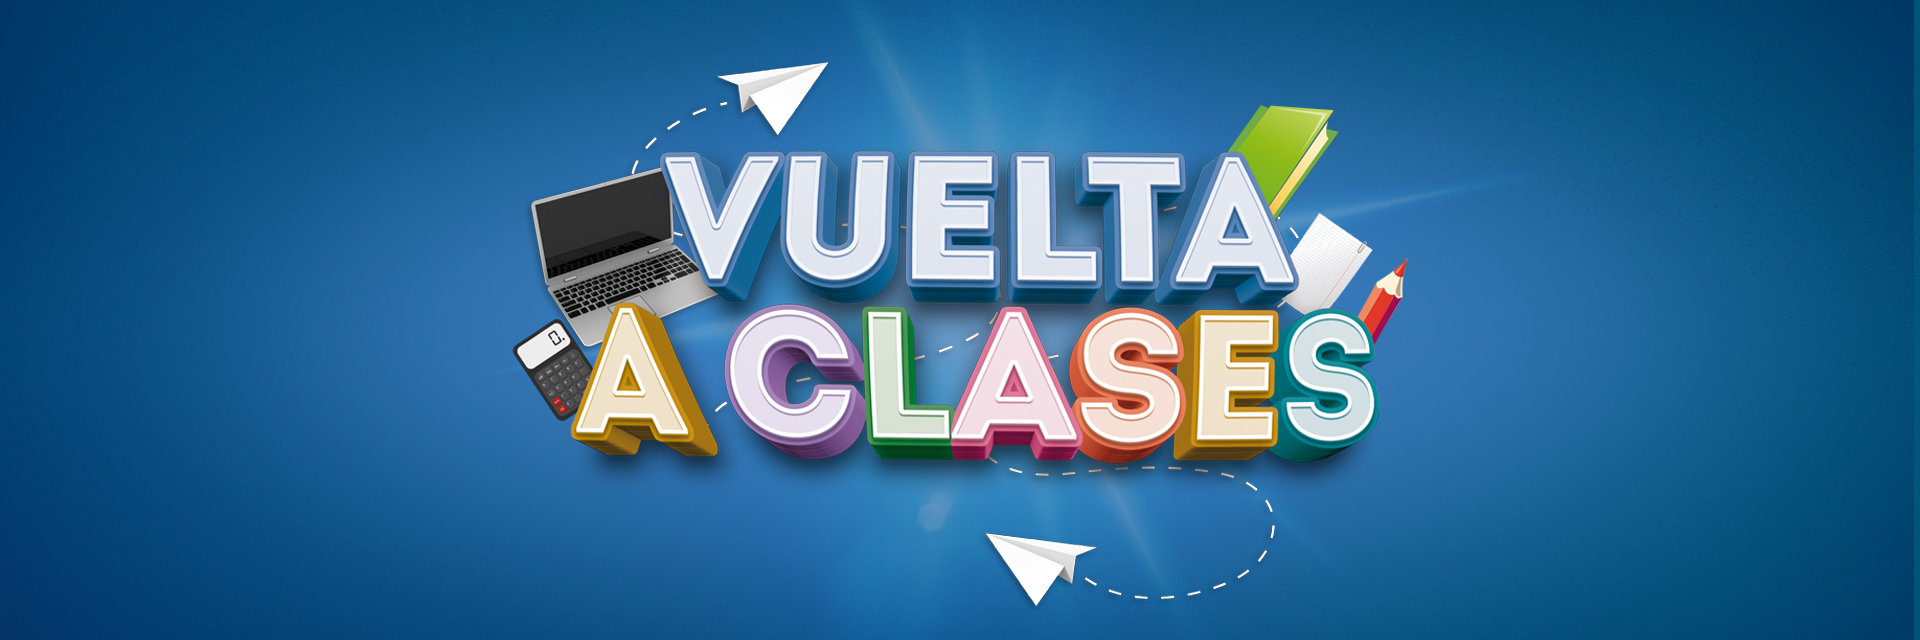 Vuelta a Clases!